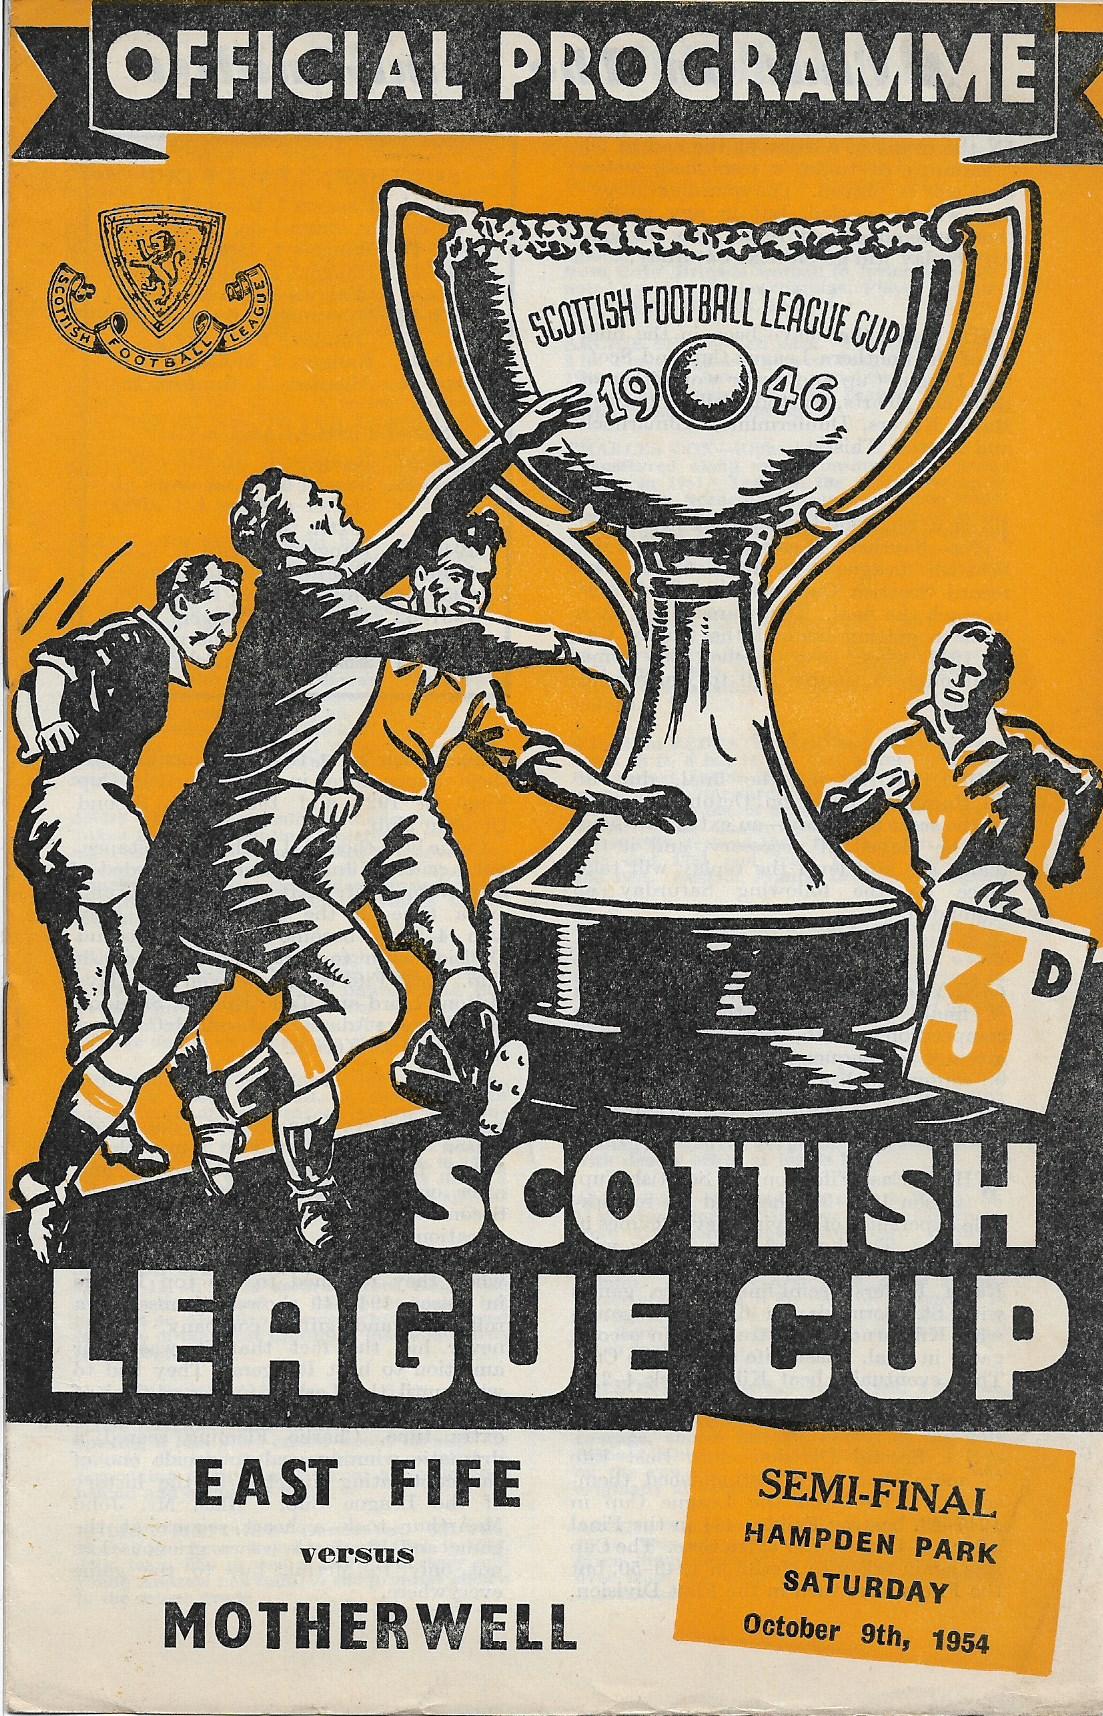 League Cup Semi Final Programme Cover vs East Fife